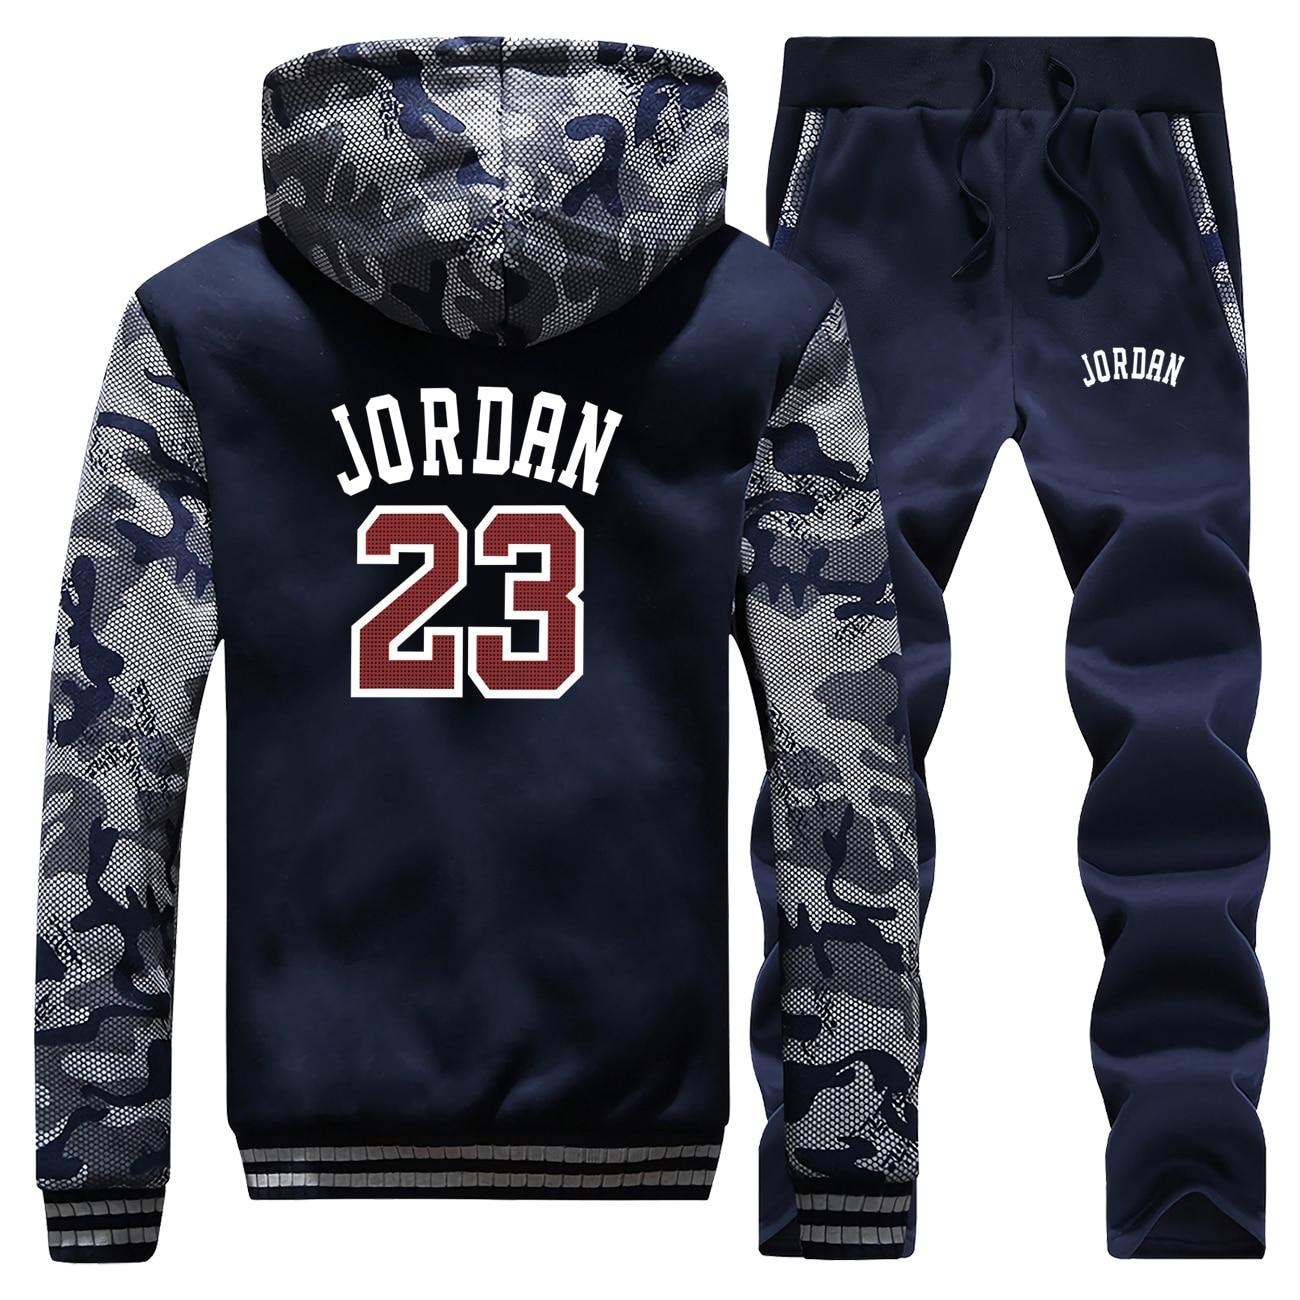 Fashion Jordan 23 Camo Sweatshirt Hoodies+Pants Mens Two Piece Sets Men Casual Tracksuit Fleece Jordan 23 Sportswear Sweatpants